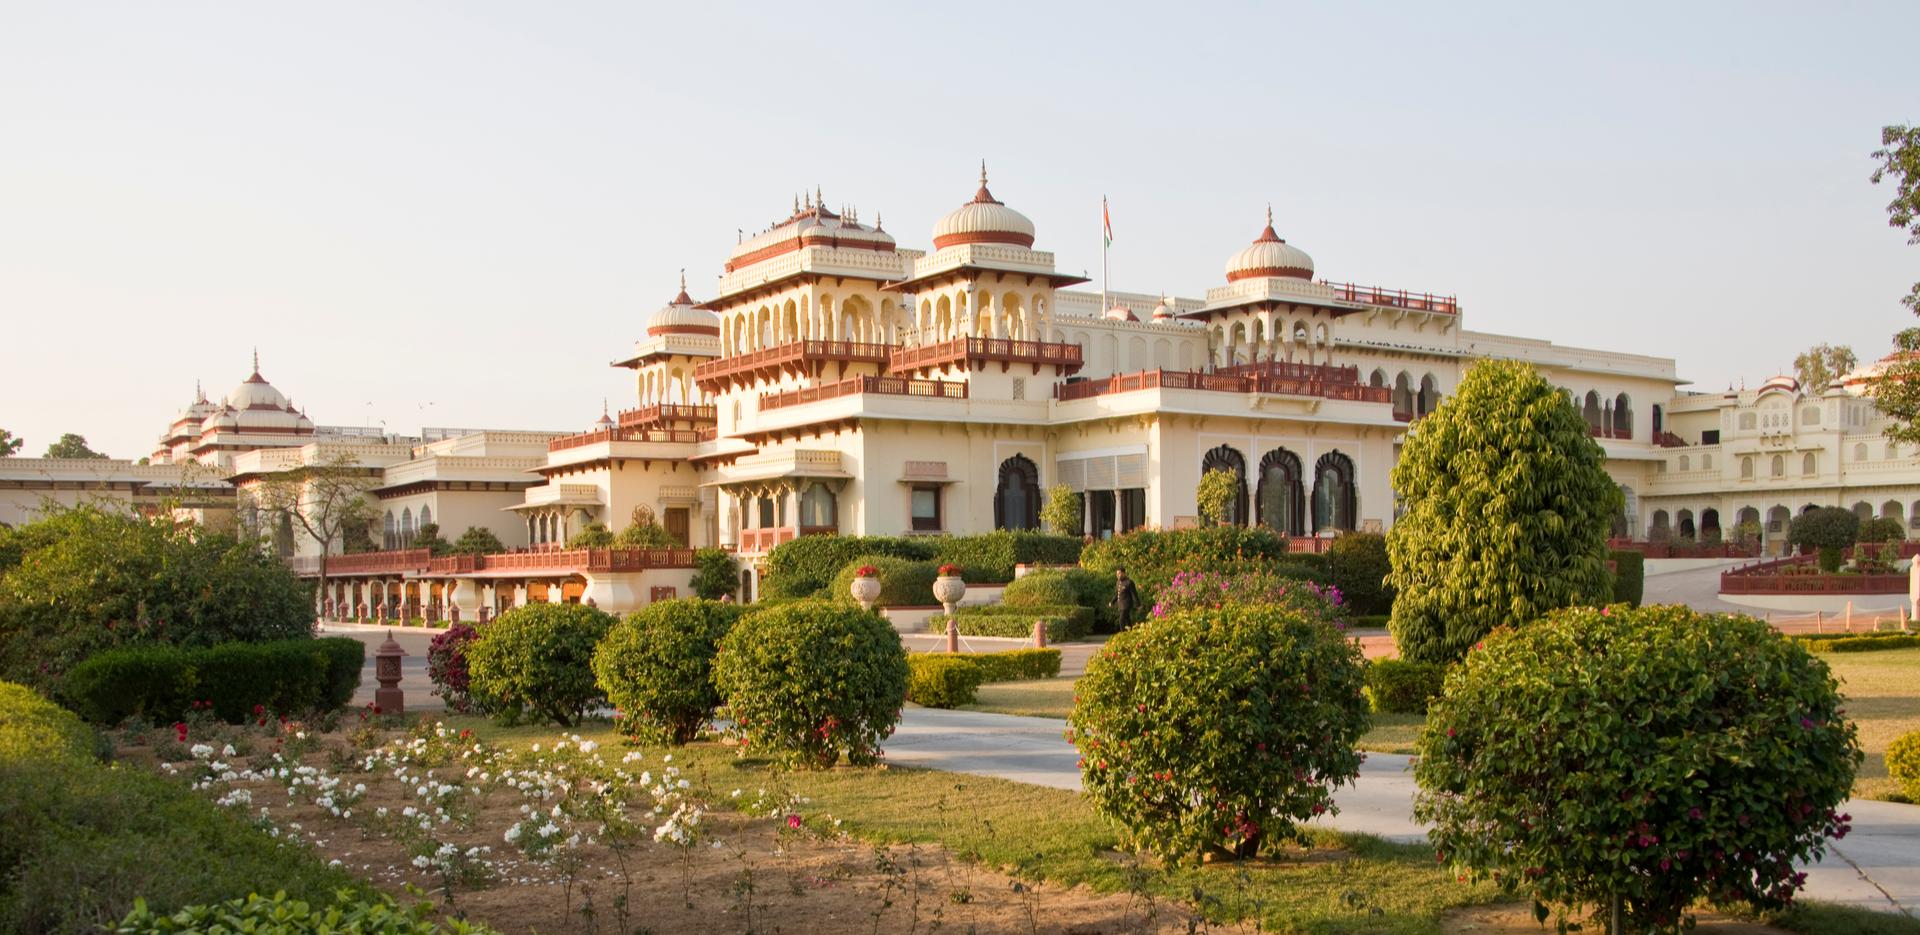 Resort in Jaipur